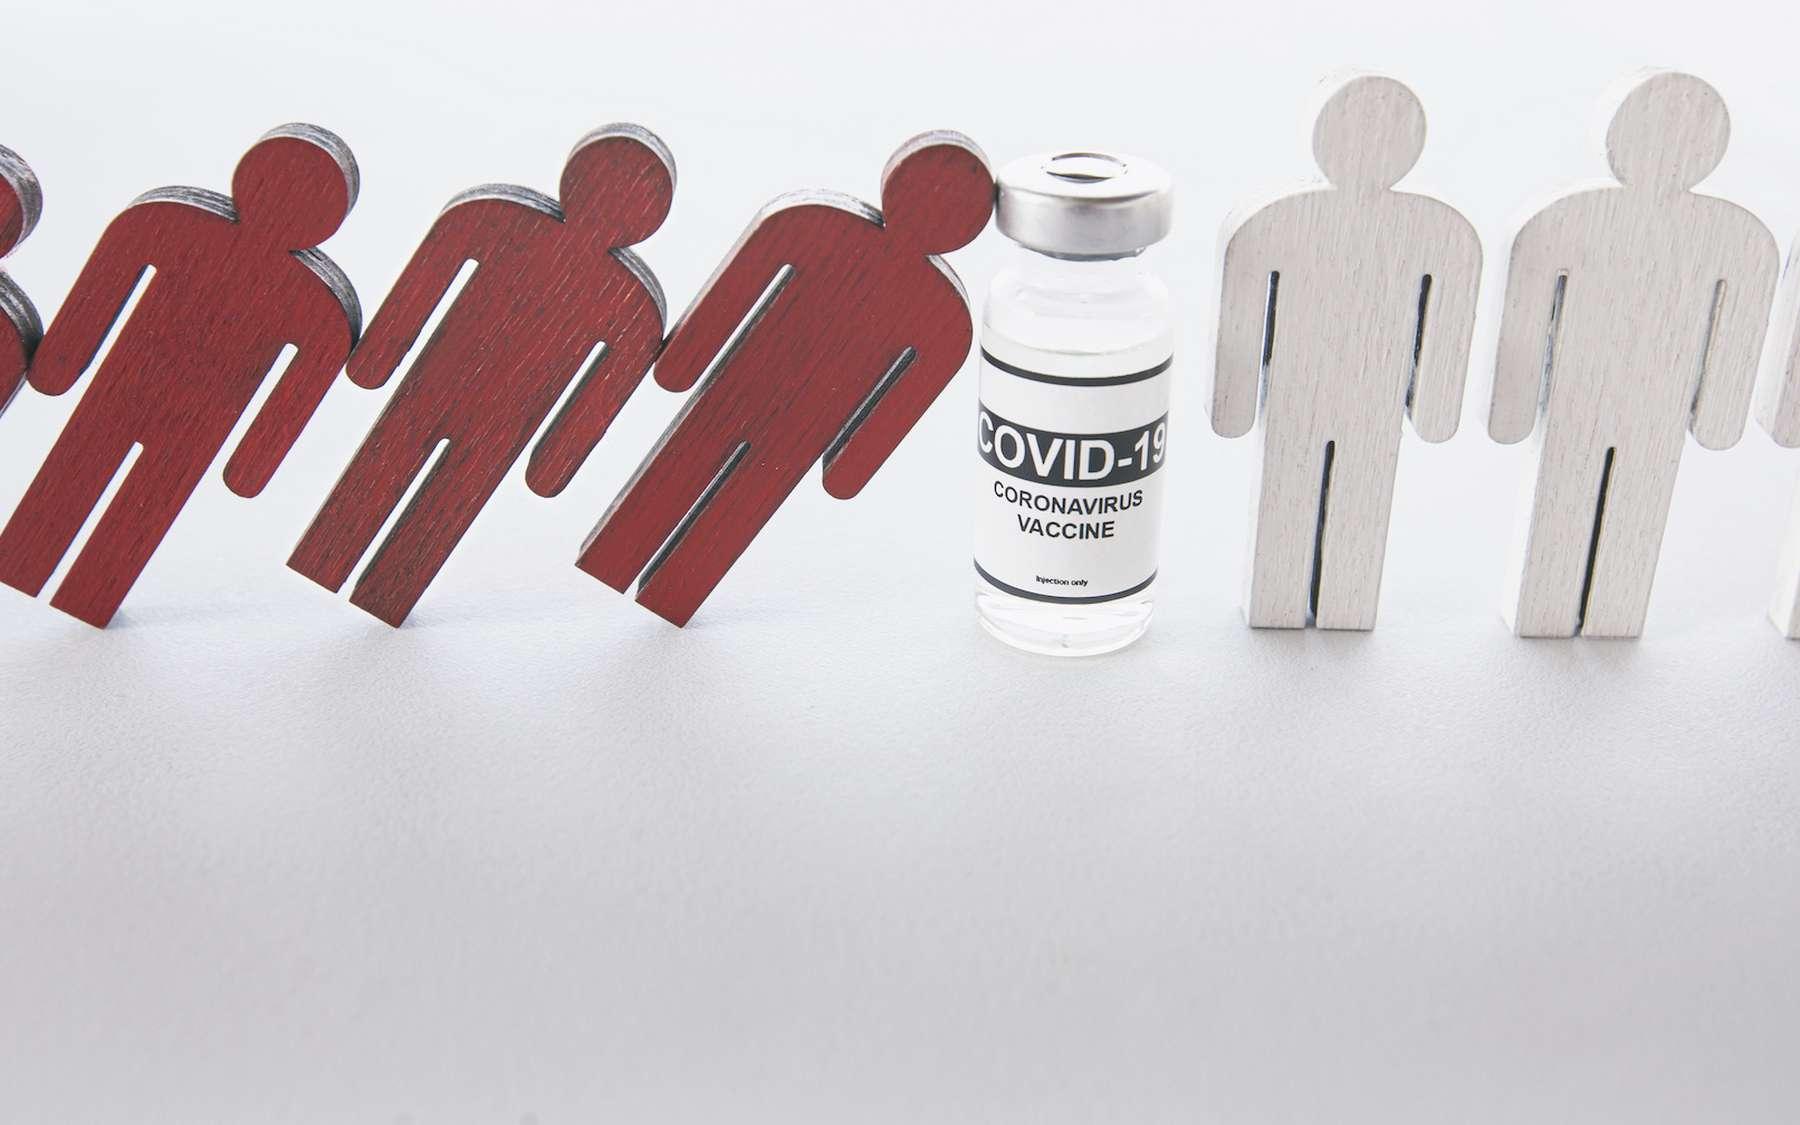 Aucun vaccin n'est efficace à 100 %. © SkyLine, Adobe Stock